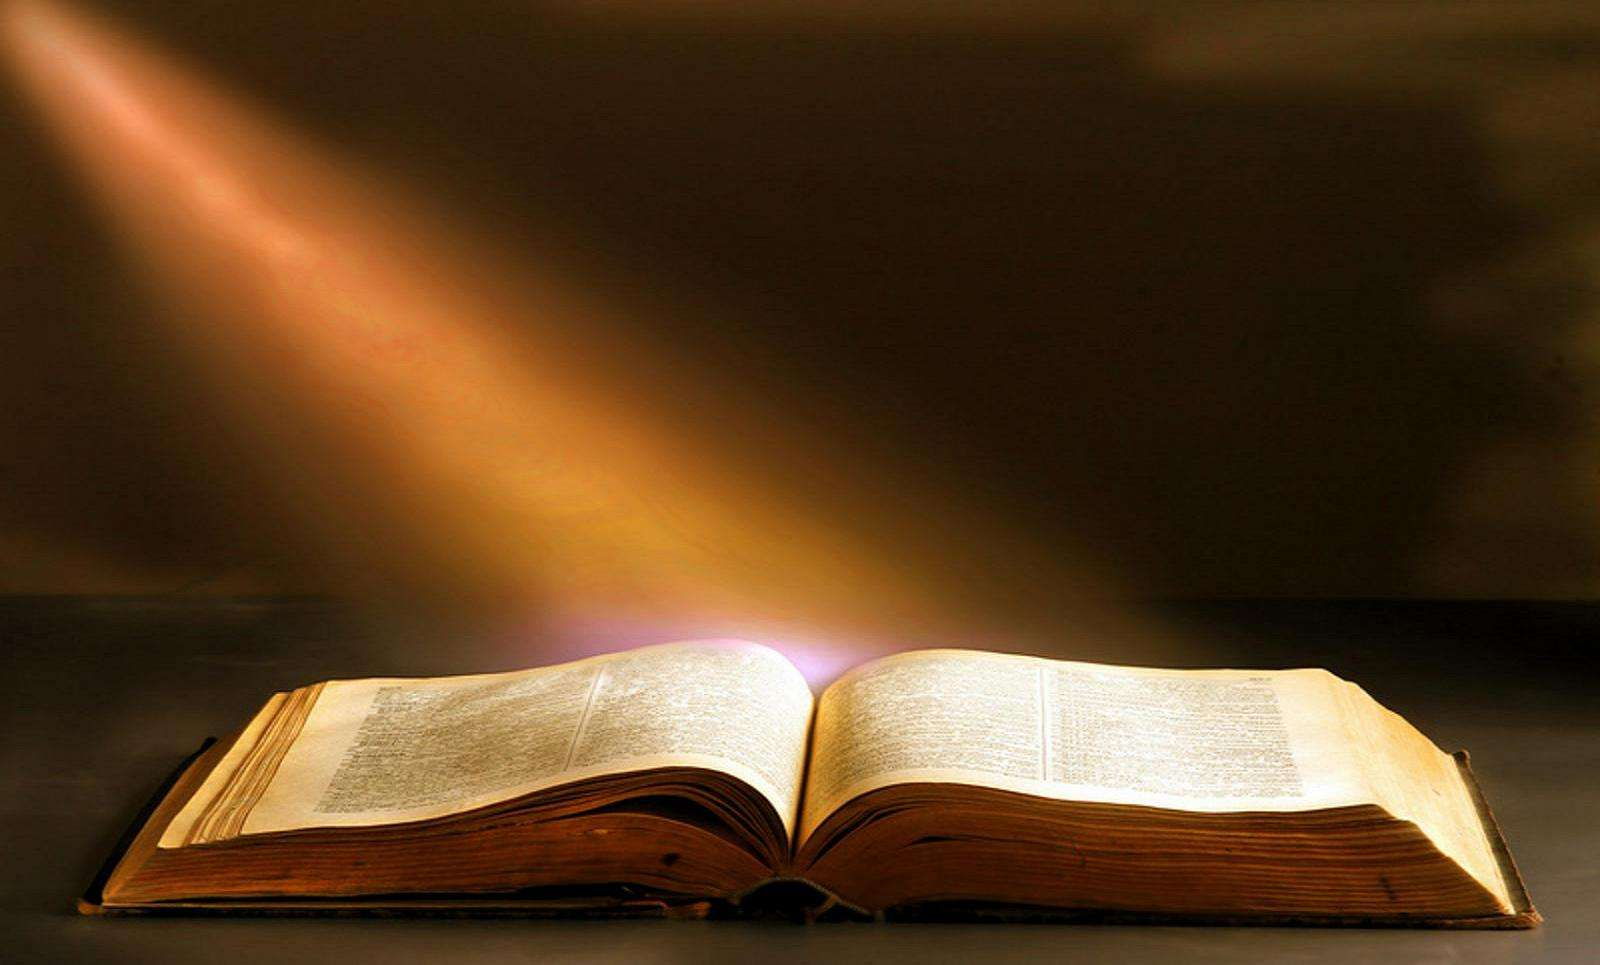 Didn't the Catholic Church add to the Bible?